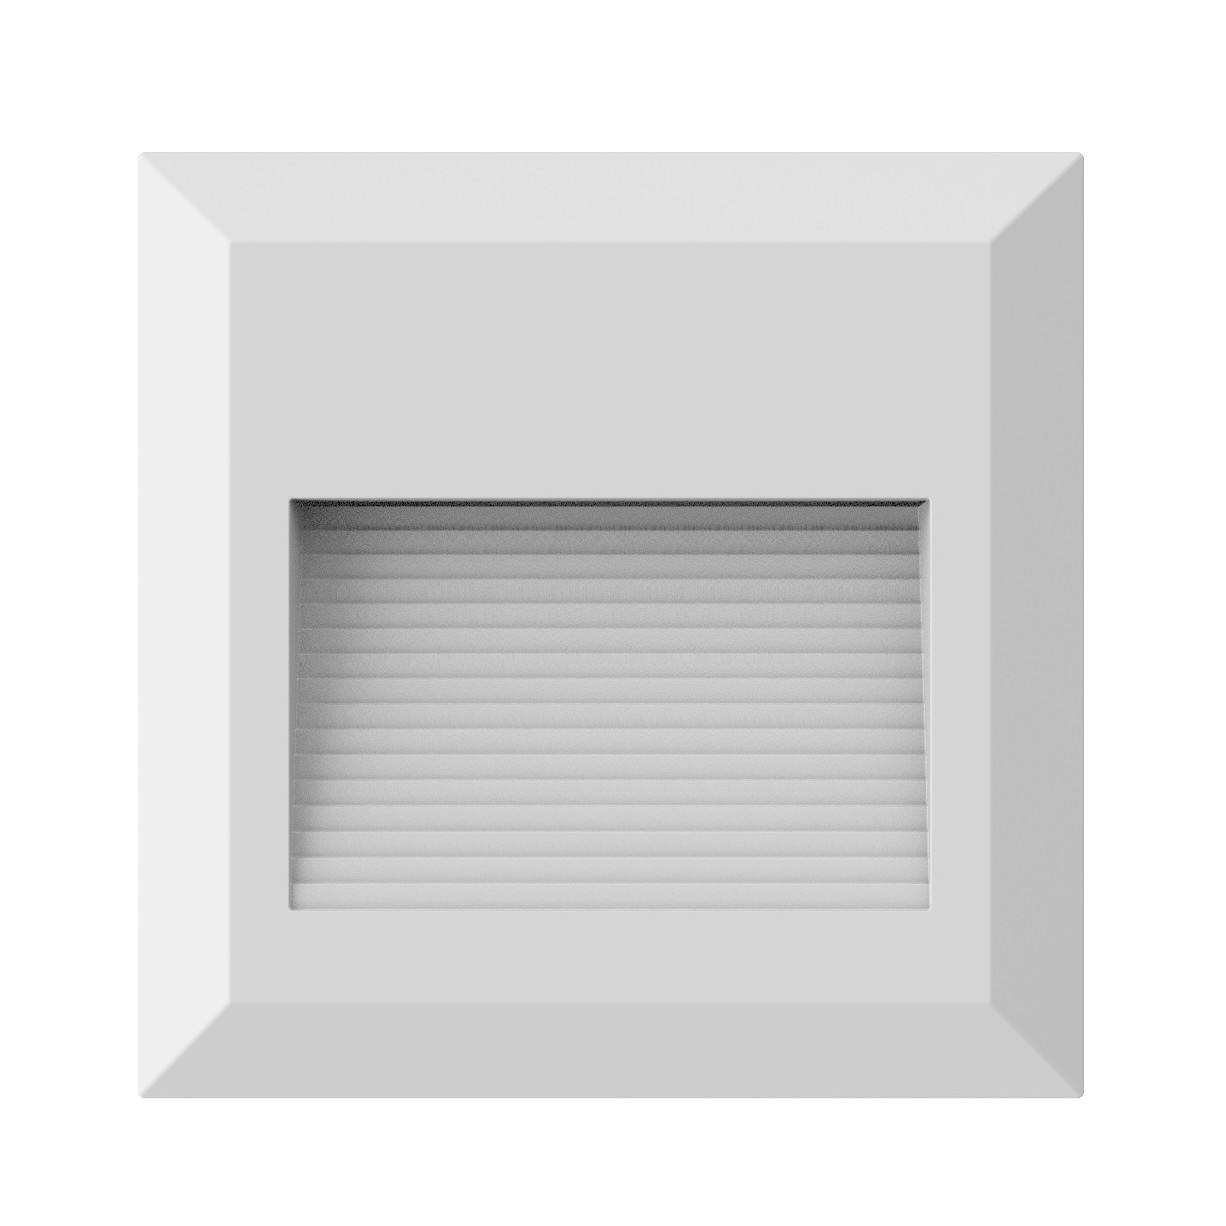 Luminaria de Sobrepor LED Balizador PLS 2W Branca IP65 - Ecoline